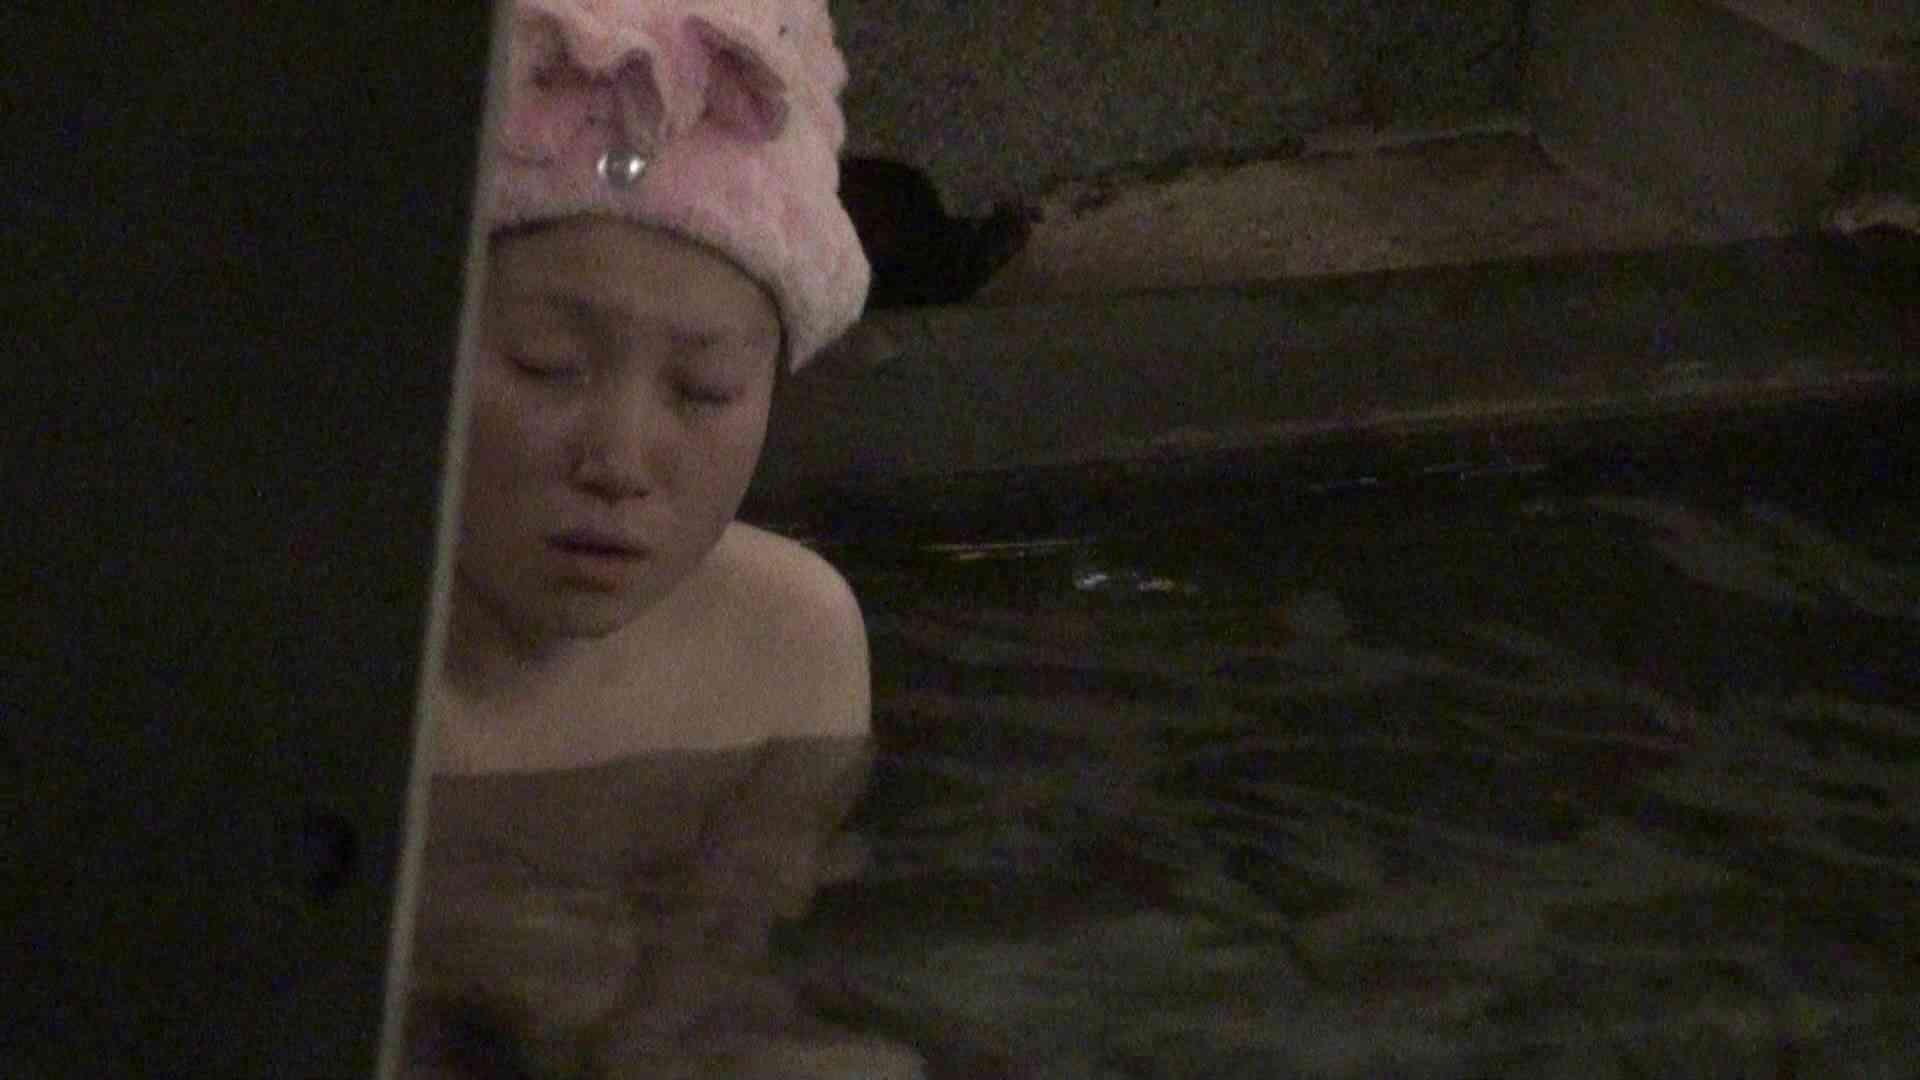 Aquaな露天風呂Vol.341 OLのエロ生活 | 露天風呂  23連発 13